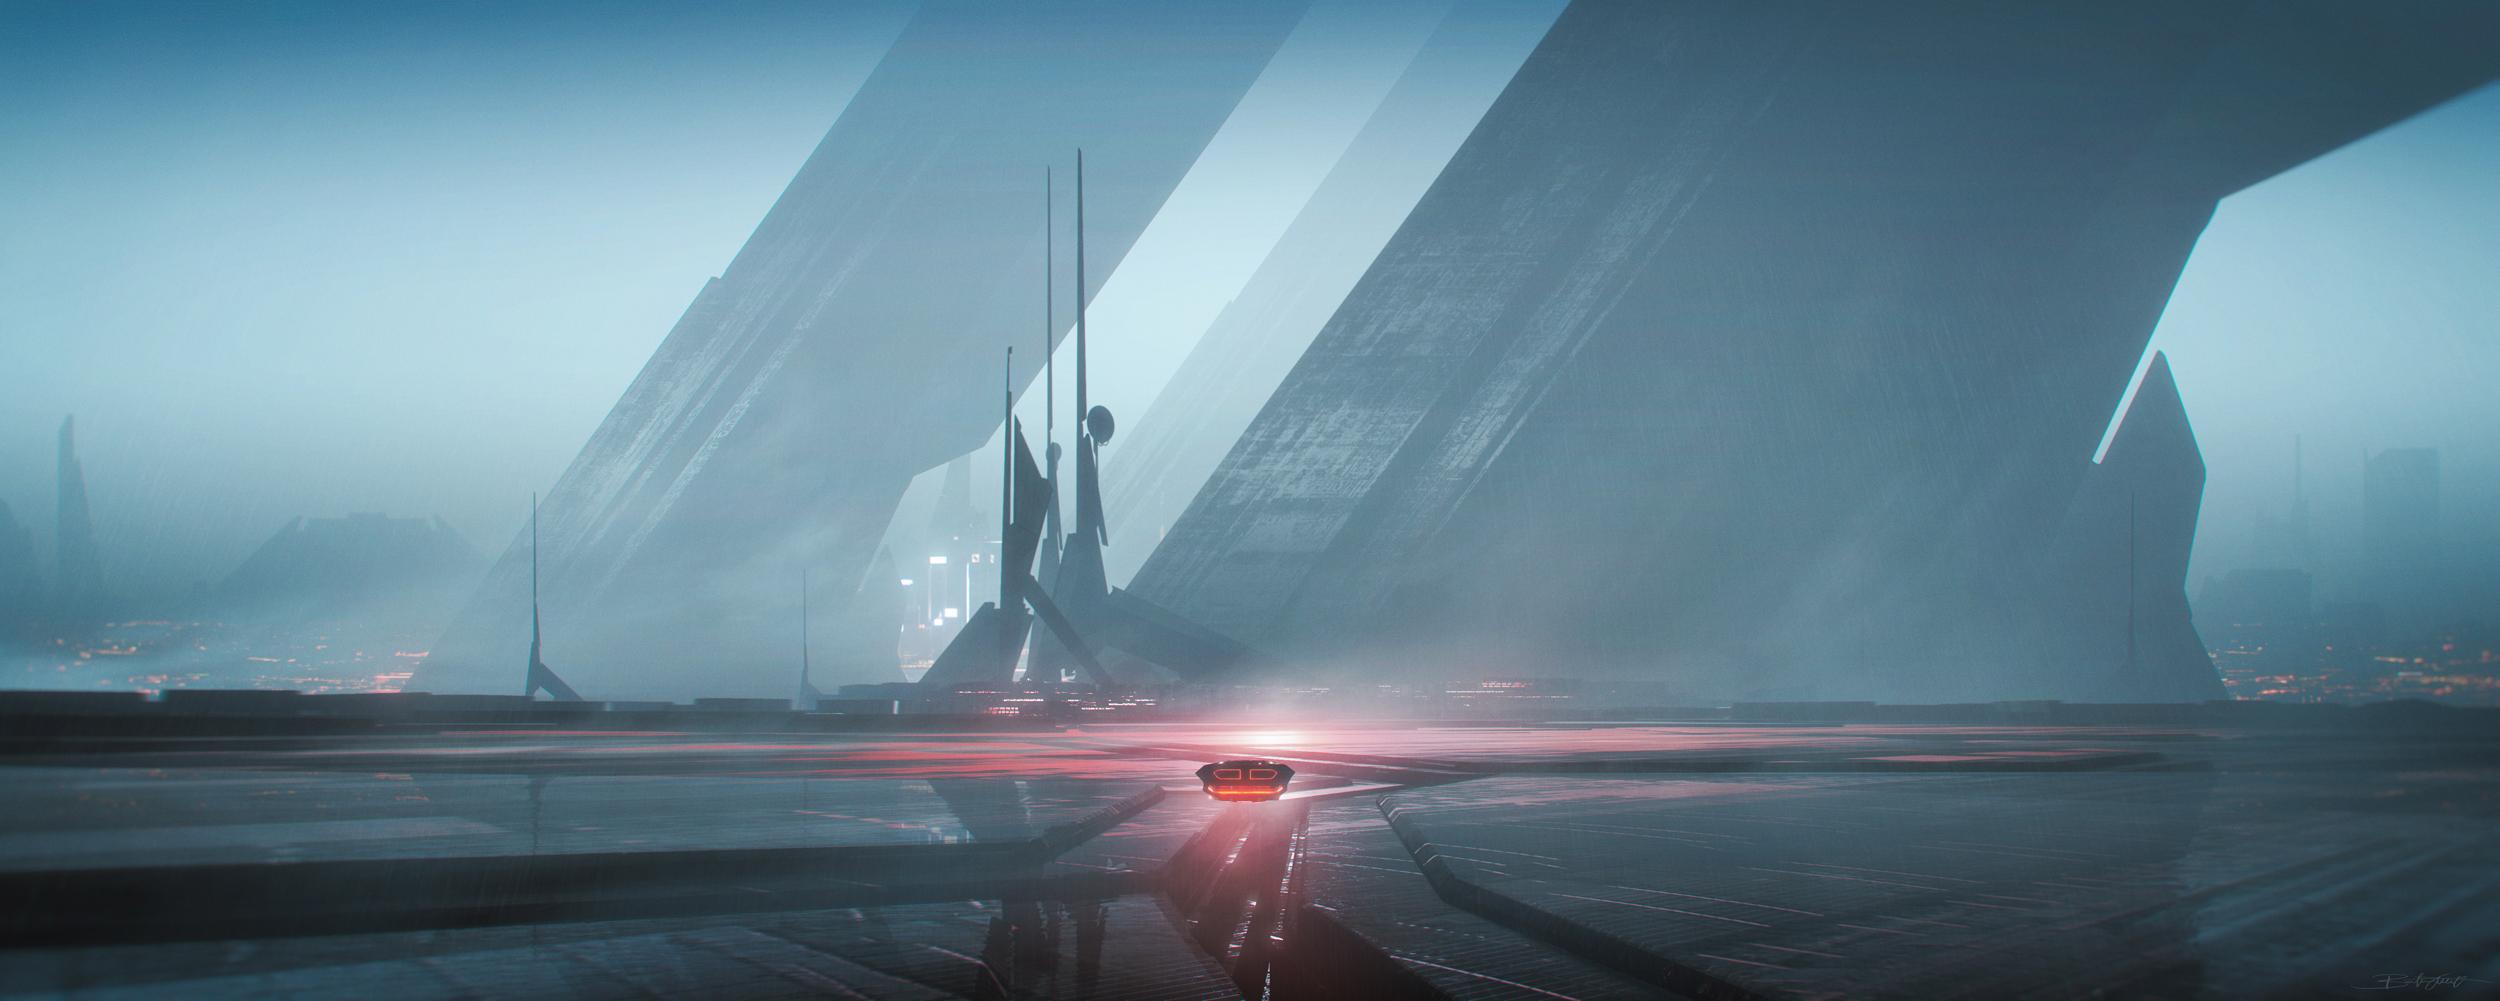 Blade Runner 2049 Tribute 3 By Grivetart 2500x1000 Wallpapers